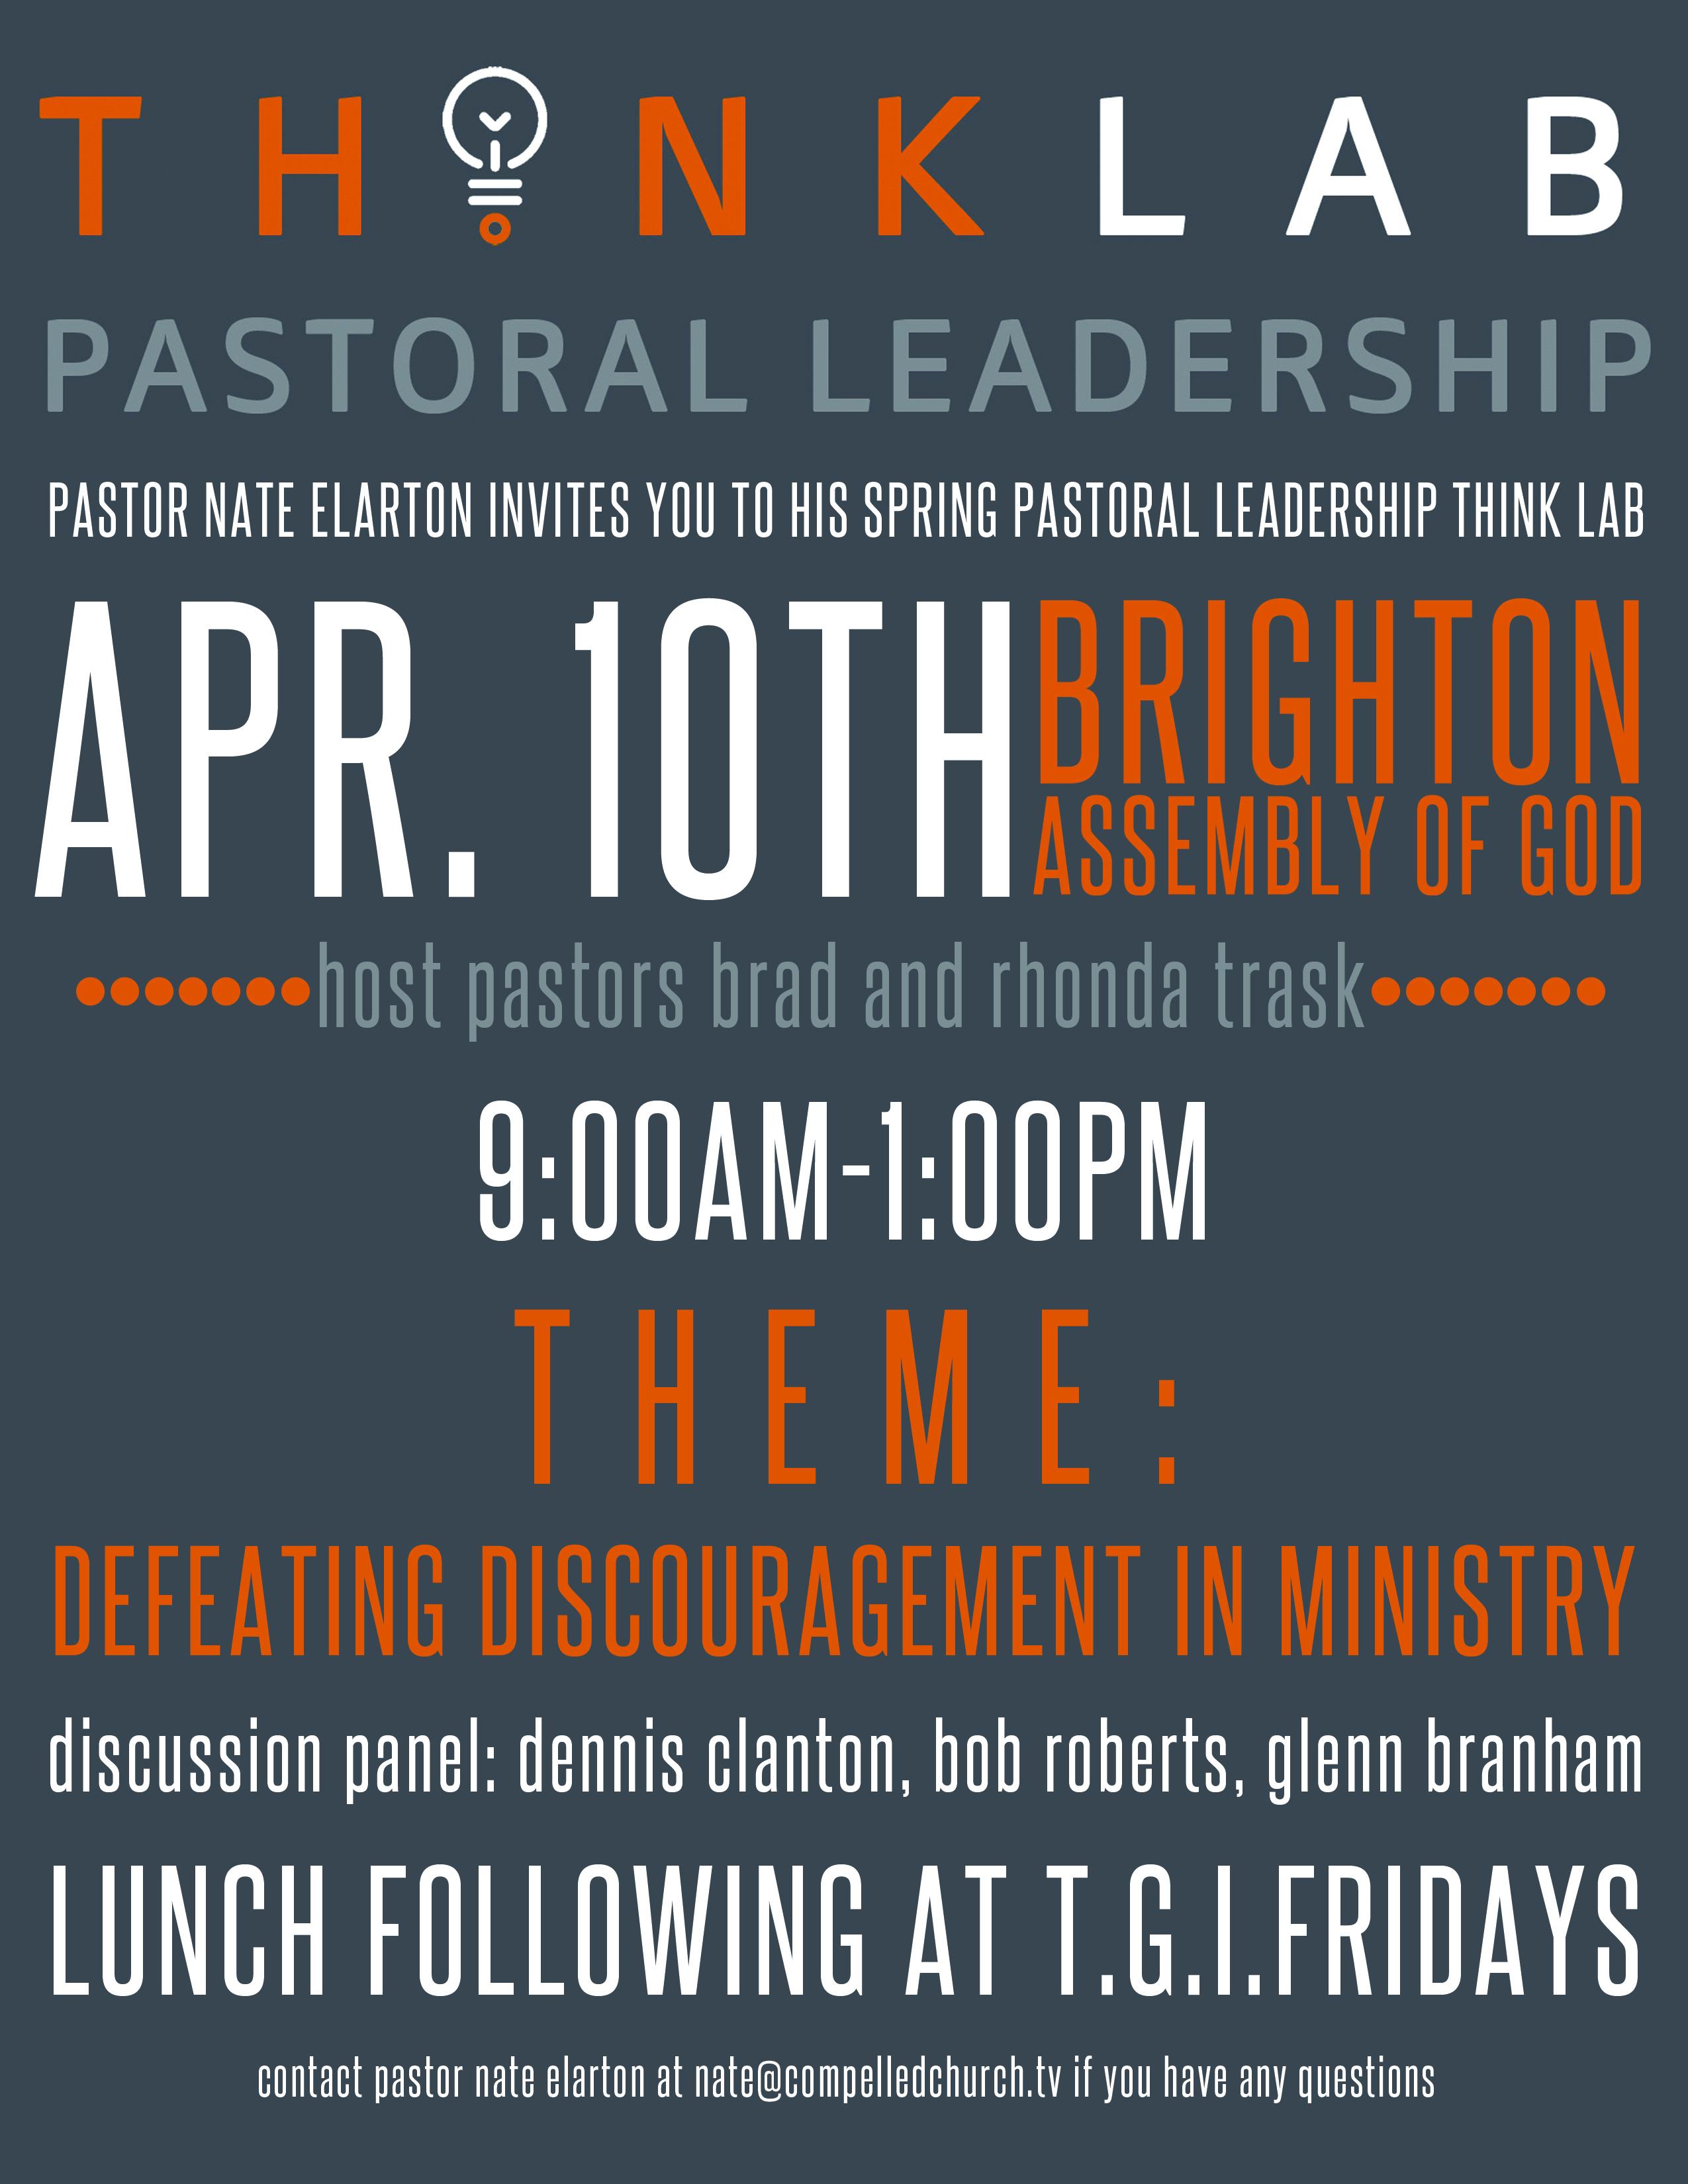 Pastoral Leadership Think Lab Coming up April 10th @Brighton A/G